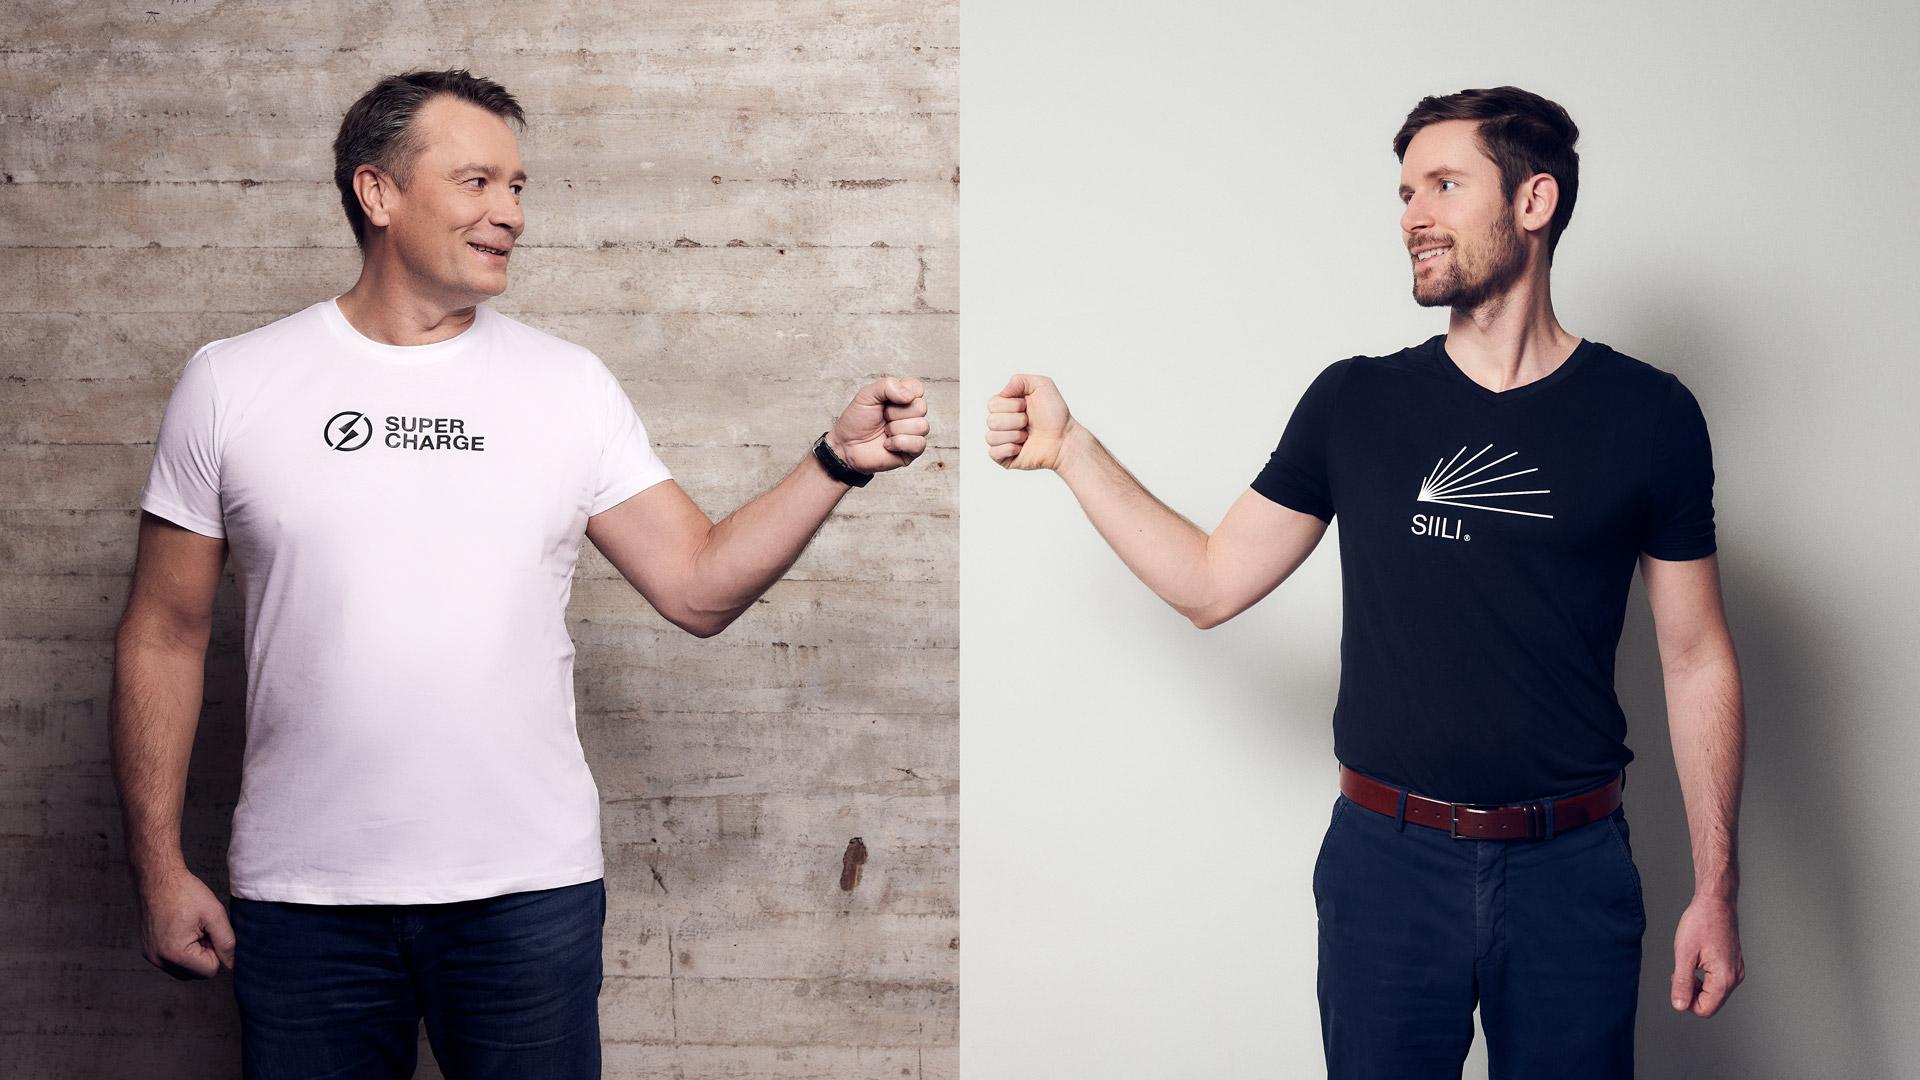 Siili's CEO Marko Somerma and Supercharge's CEO Andras Tessenyi fistbump 1937 kilometers apart